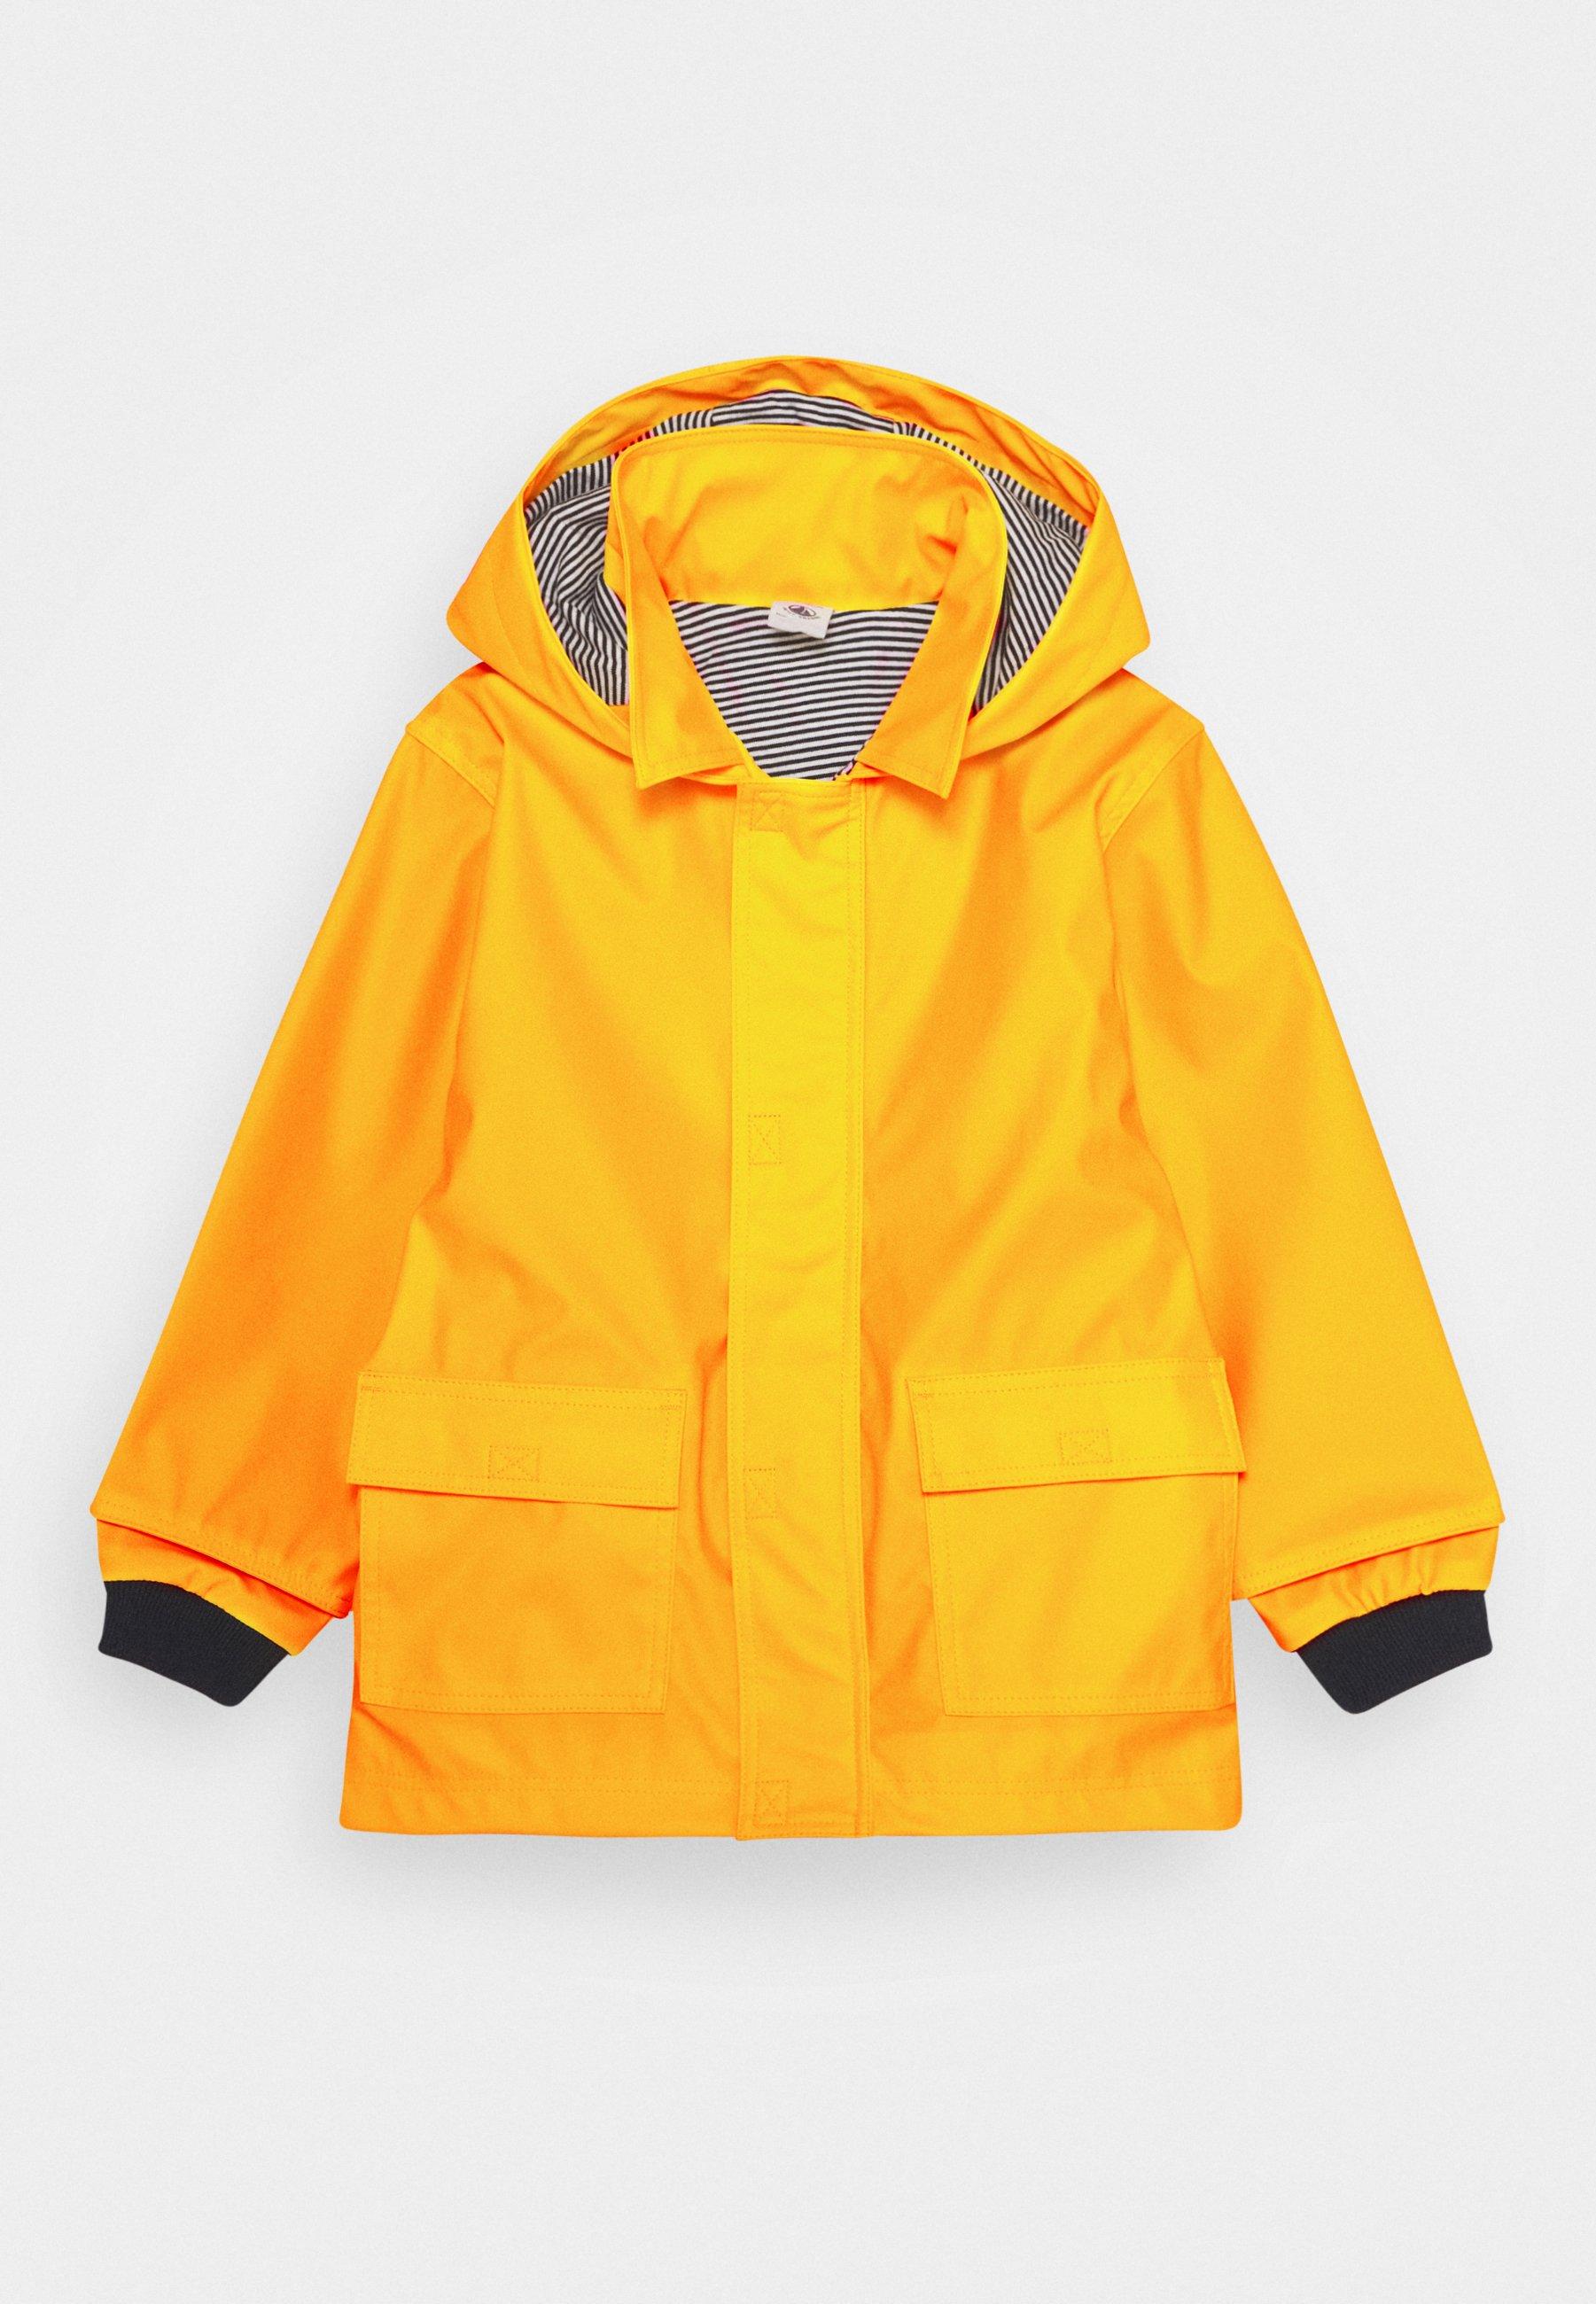 Kinder FATAH CIRE UNISEX - Regenjacke / wasserabweisende Jacke